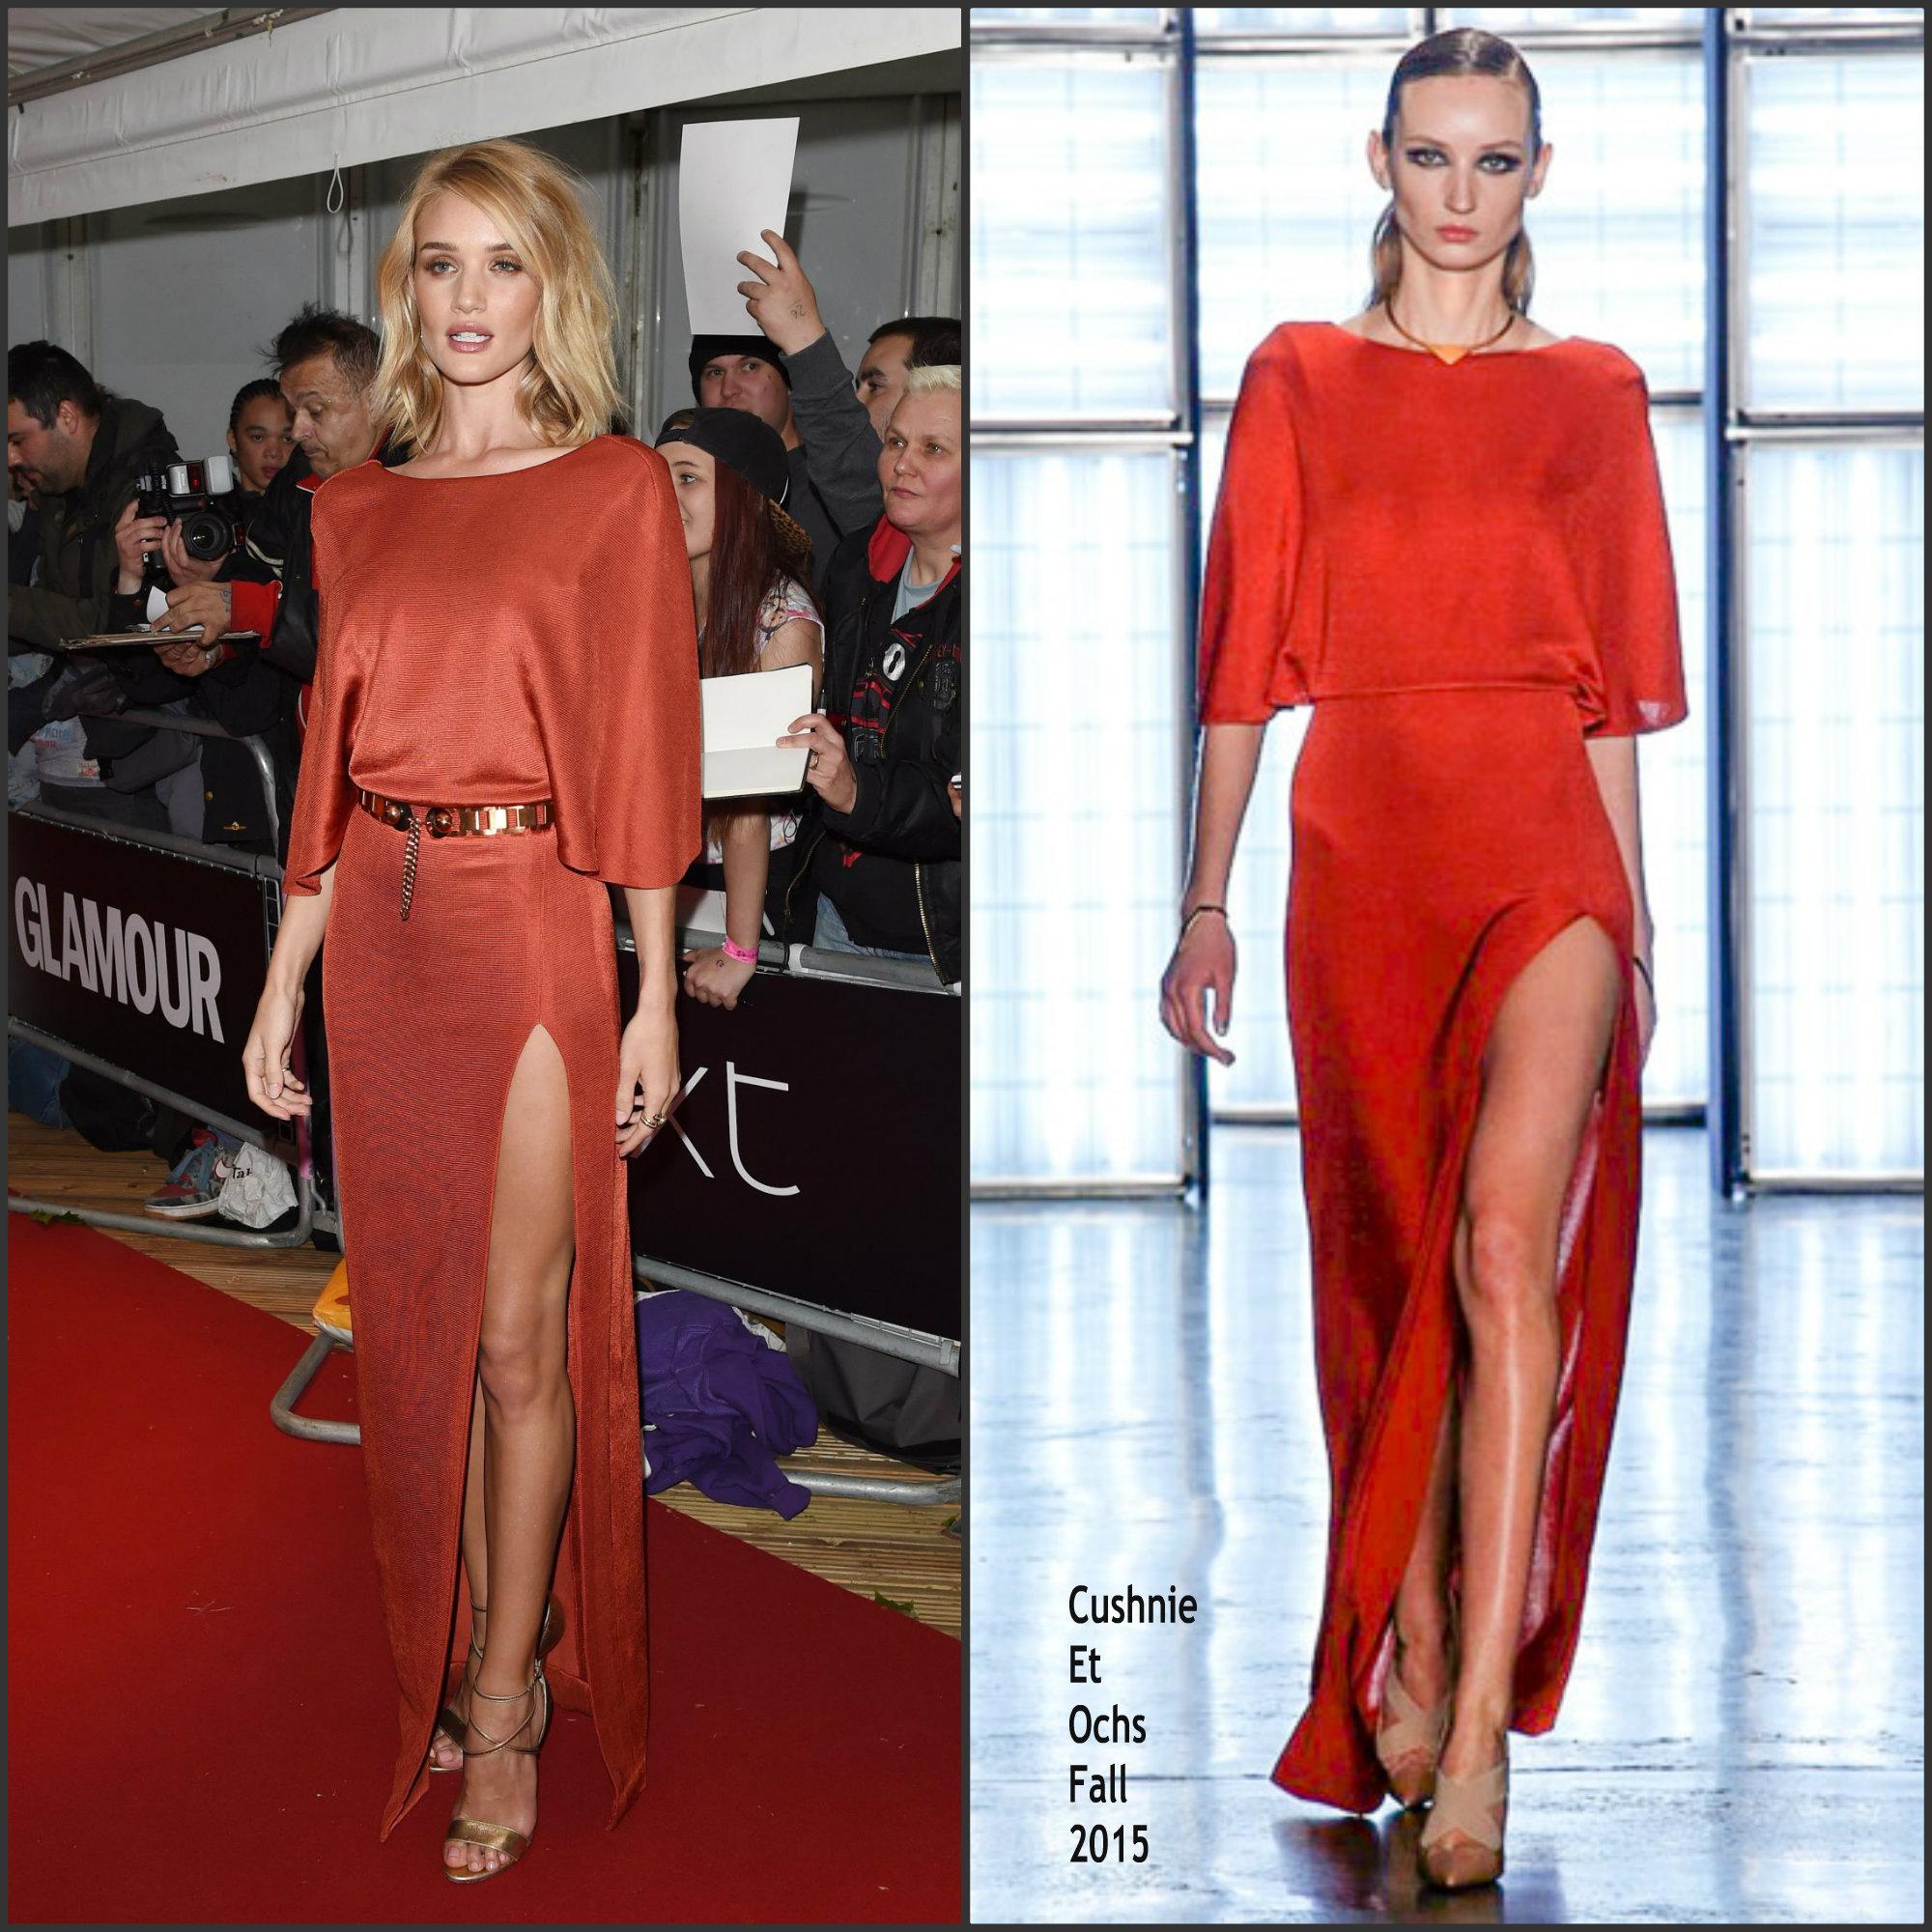 rosie-huntington-whiteley-in-cushnie-et-ochs-2015-glamour-womanof-the-year-awards